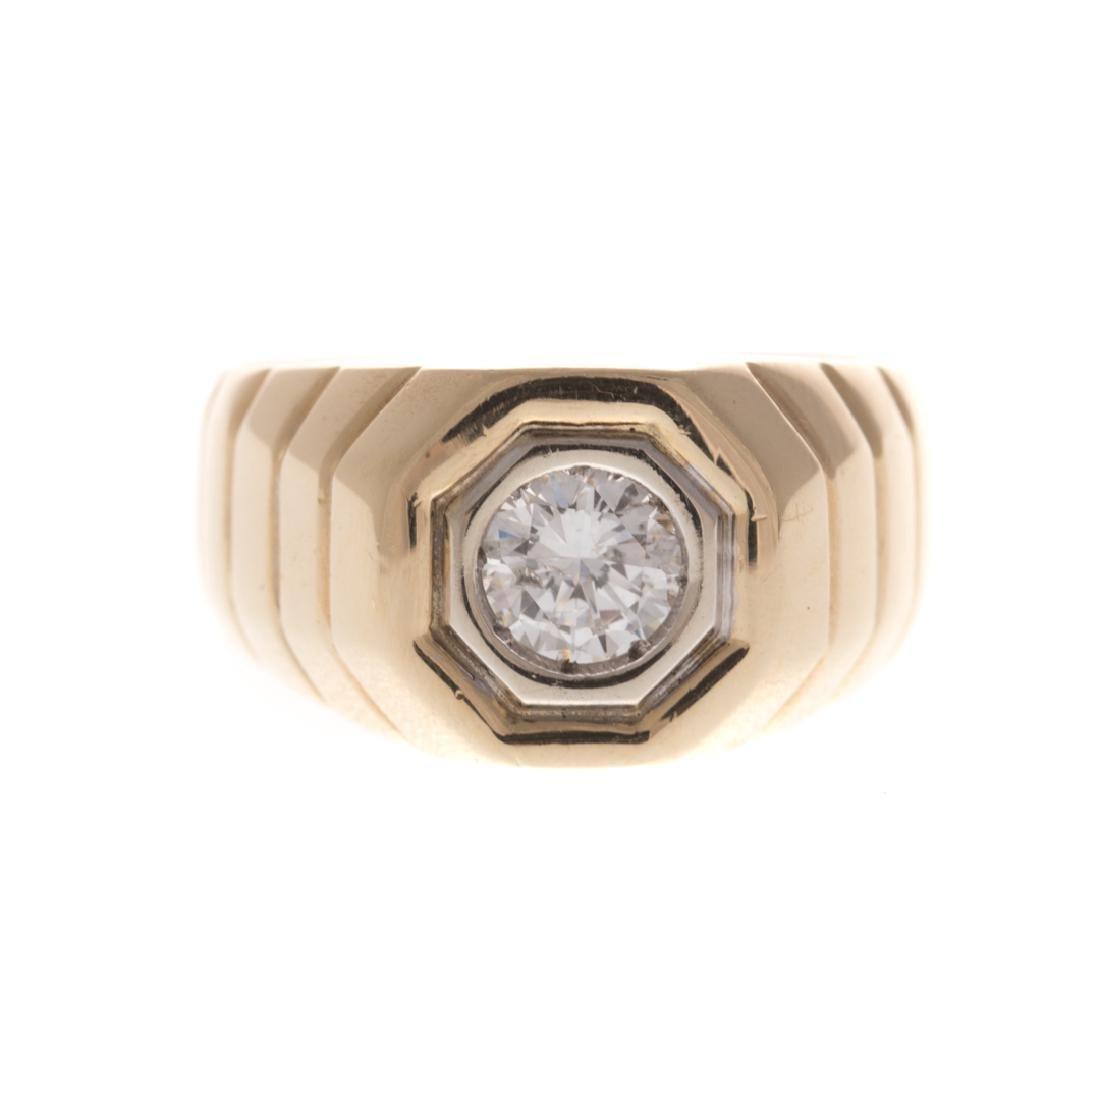 A Gentleman's Diamond Ring in 14K Gold